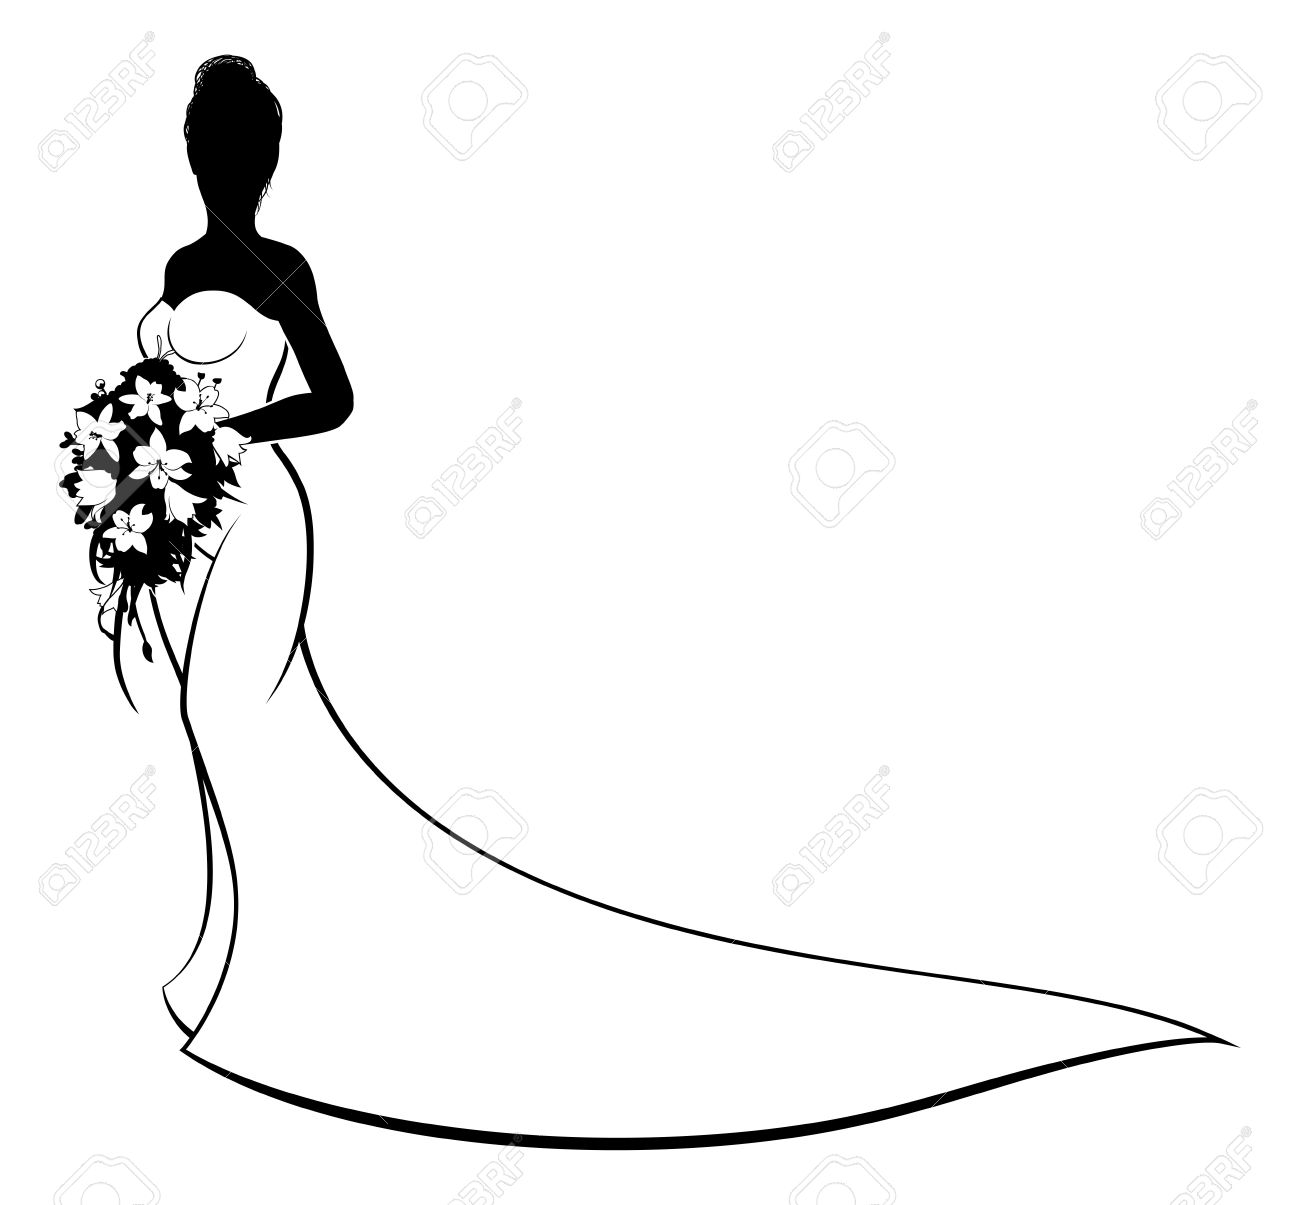 Black bridesmaid dress clipart banner transparent stock Bride Clipart | Free download best Bride Clipart on ClipArtMag.com banner transparent stock